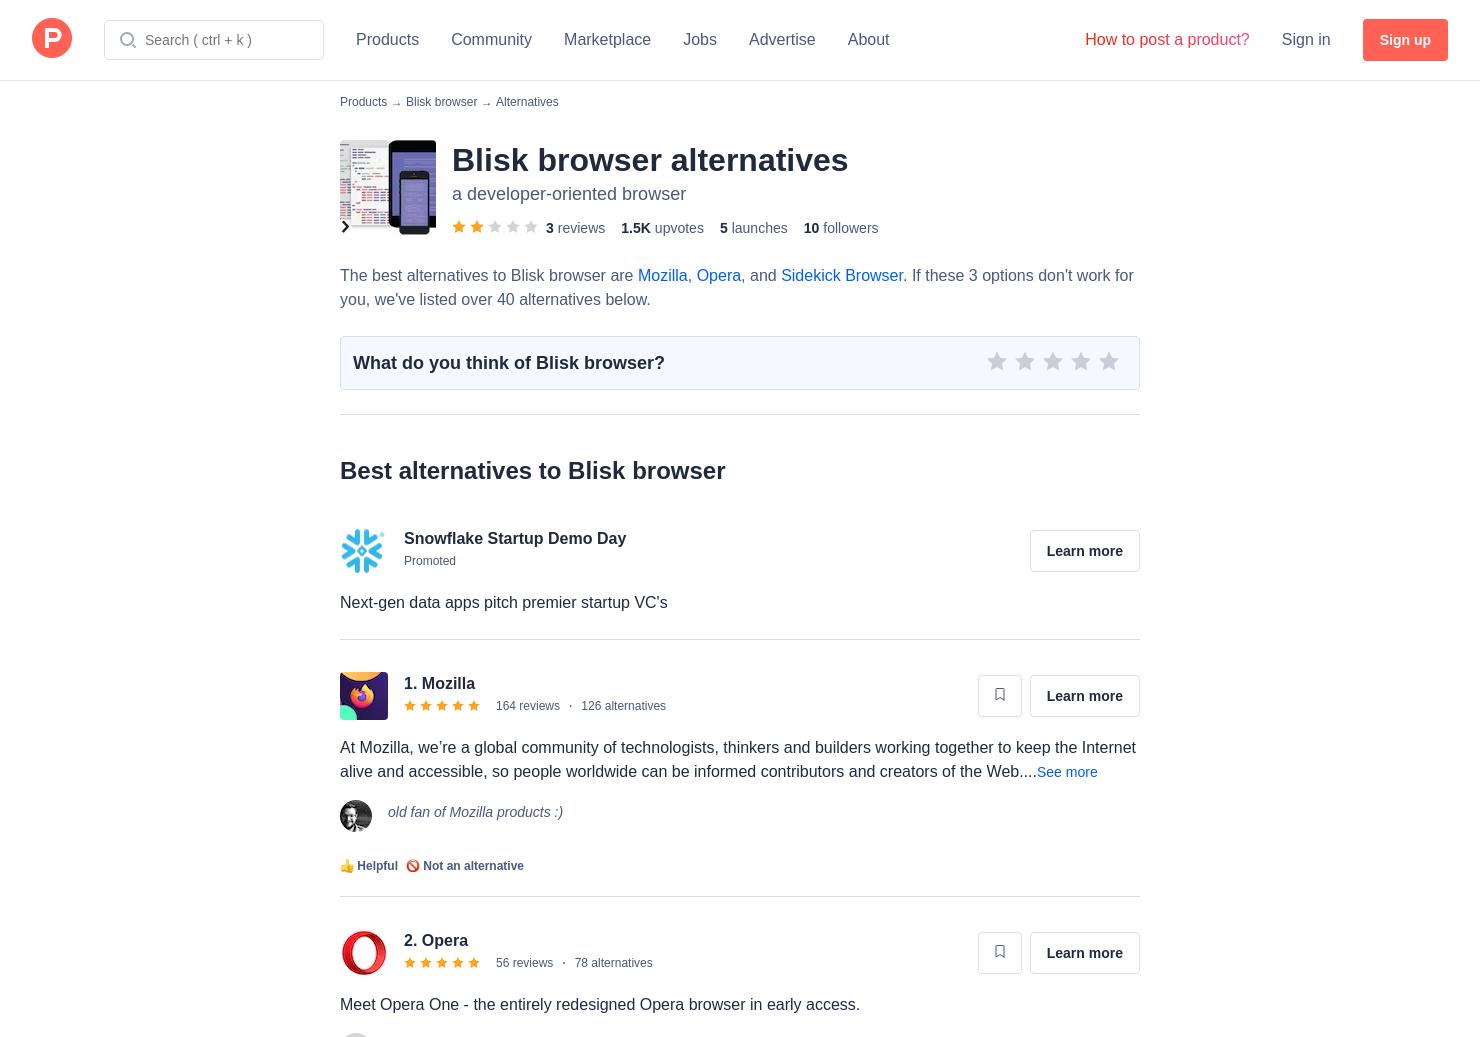 23 Alternatives to Blisk Browser for Windows, Mac | Product Hunt